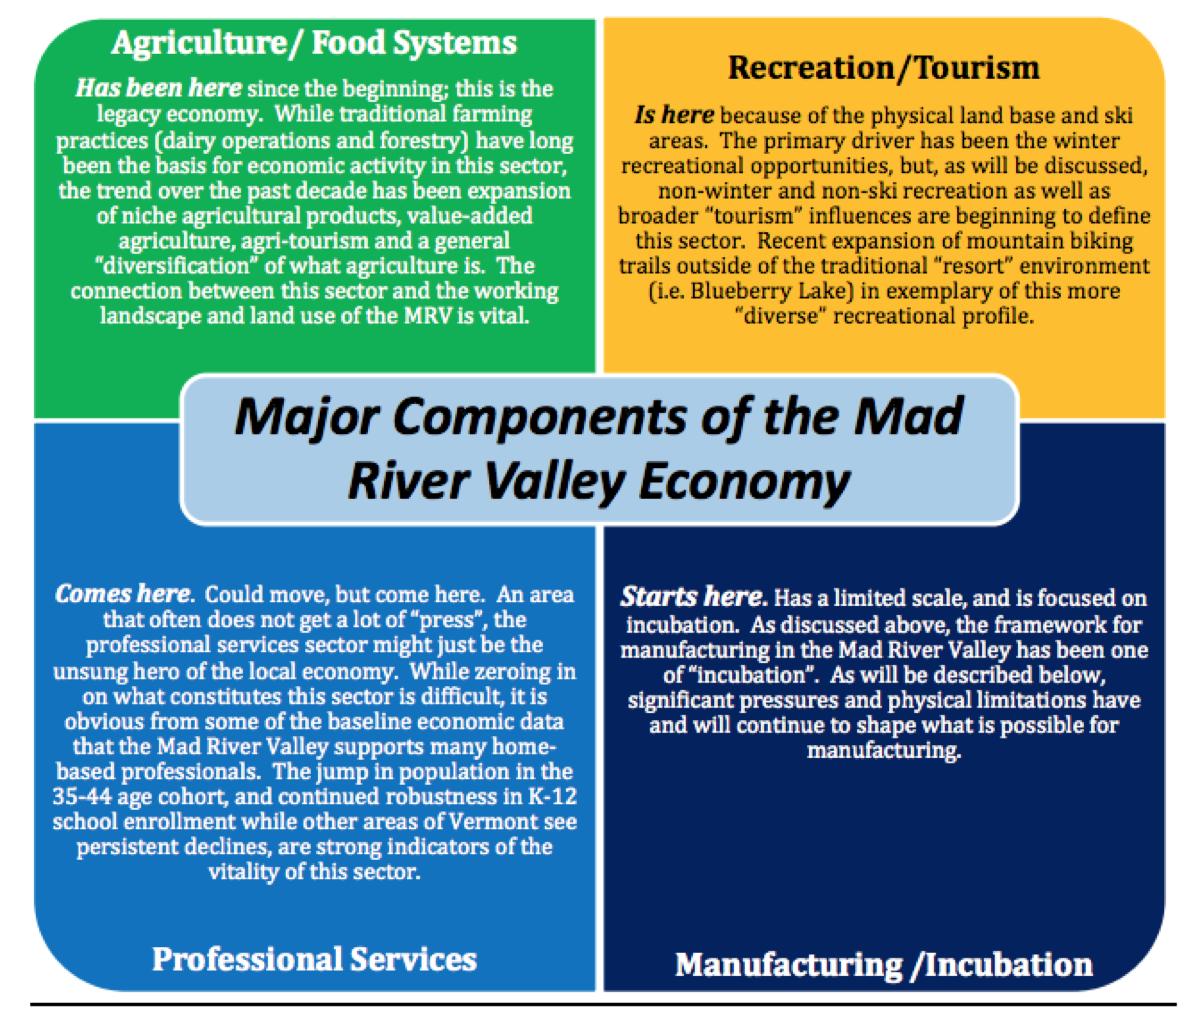 Source: 2014 MRV Economic Study, SE Group, Birchline Planning LLC, & Doug Kennedy Advisors.